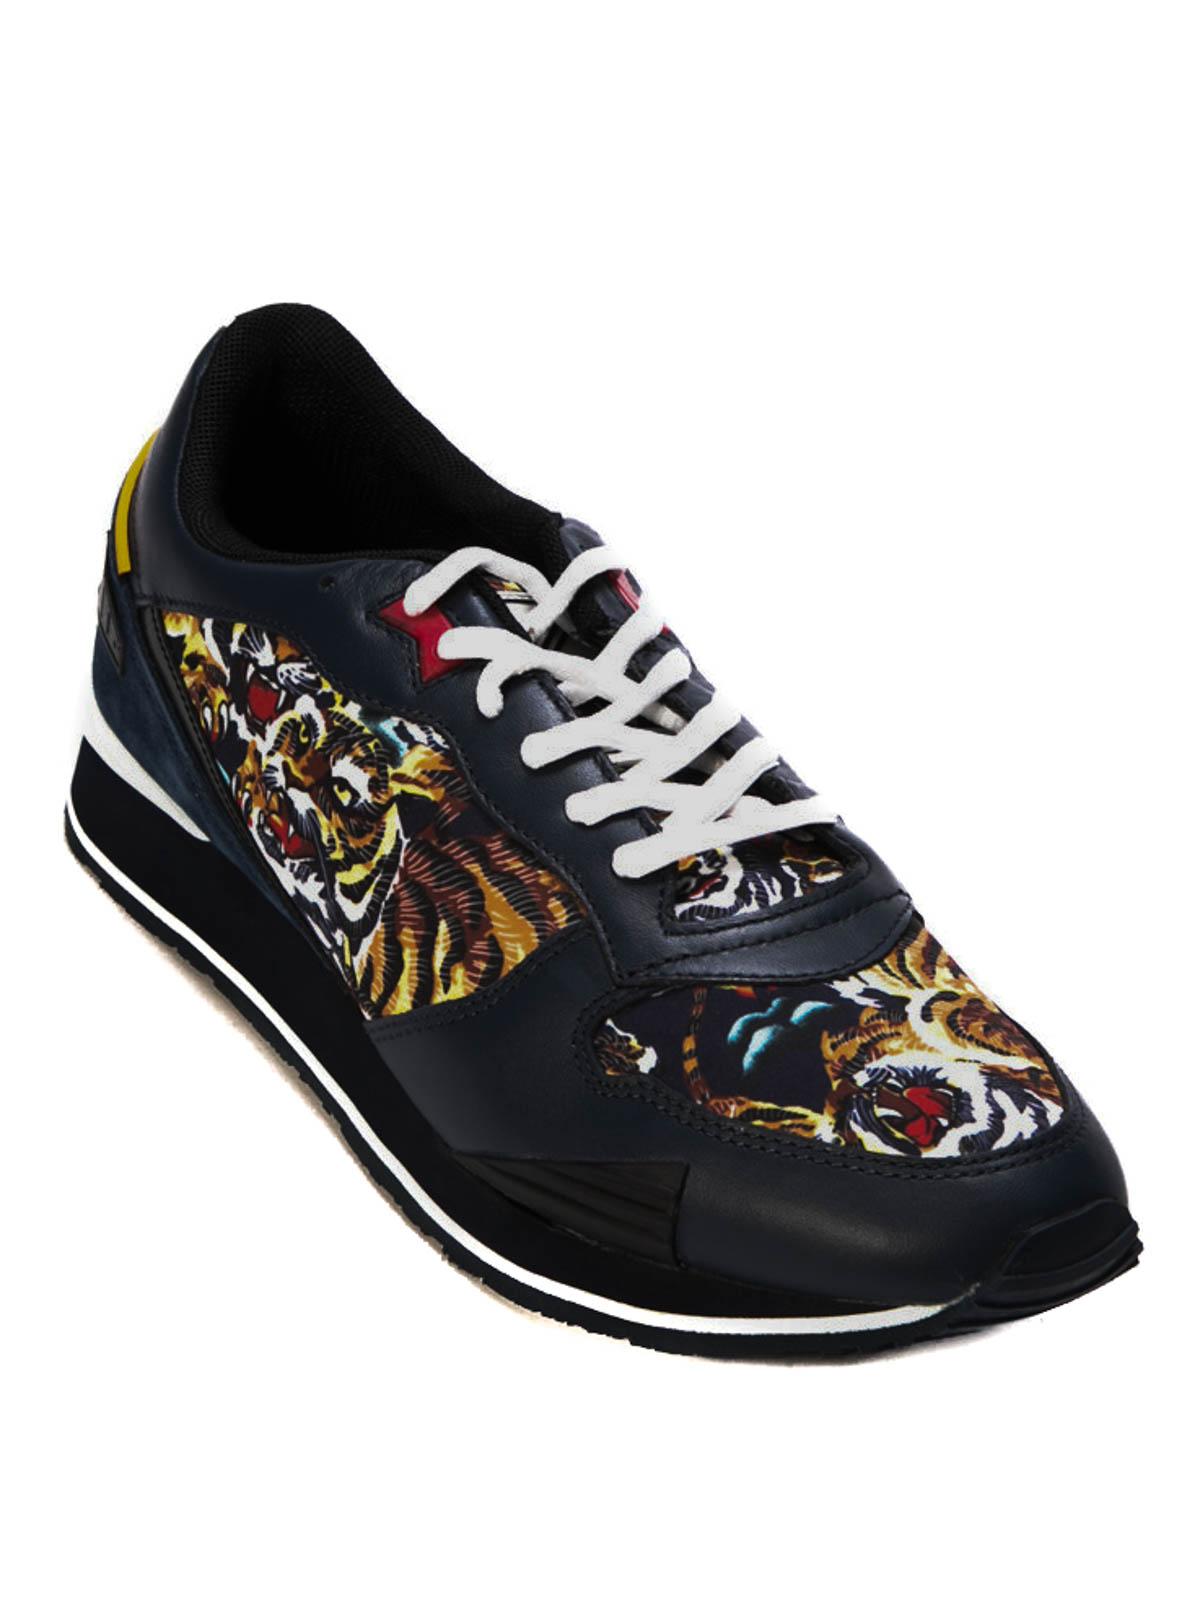 Kenzo - Flying Tiger sneakers